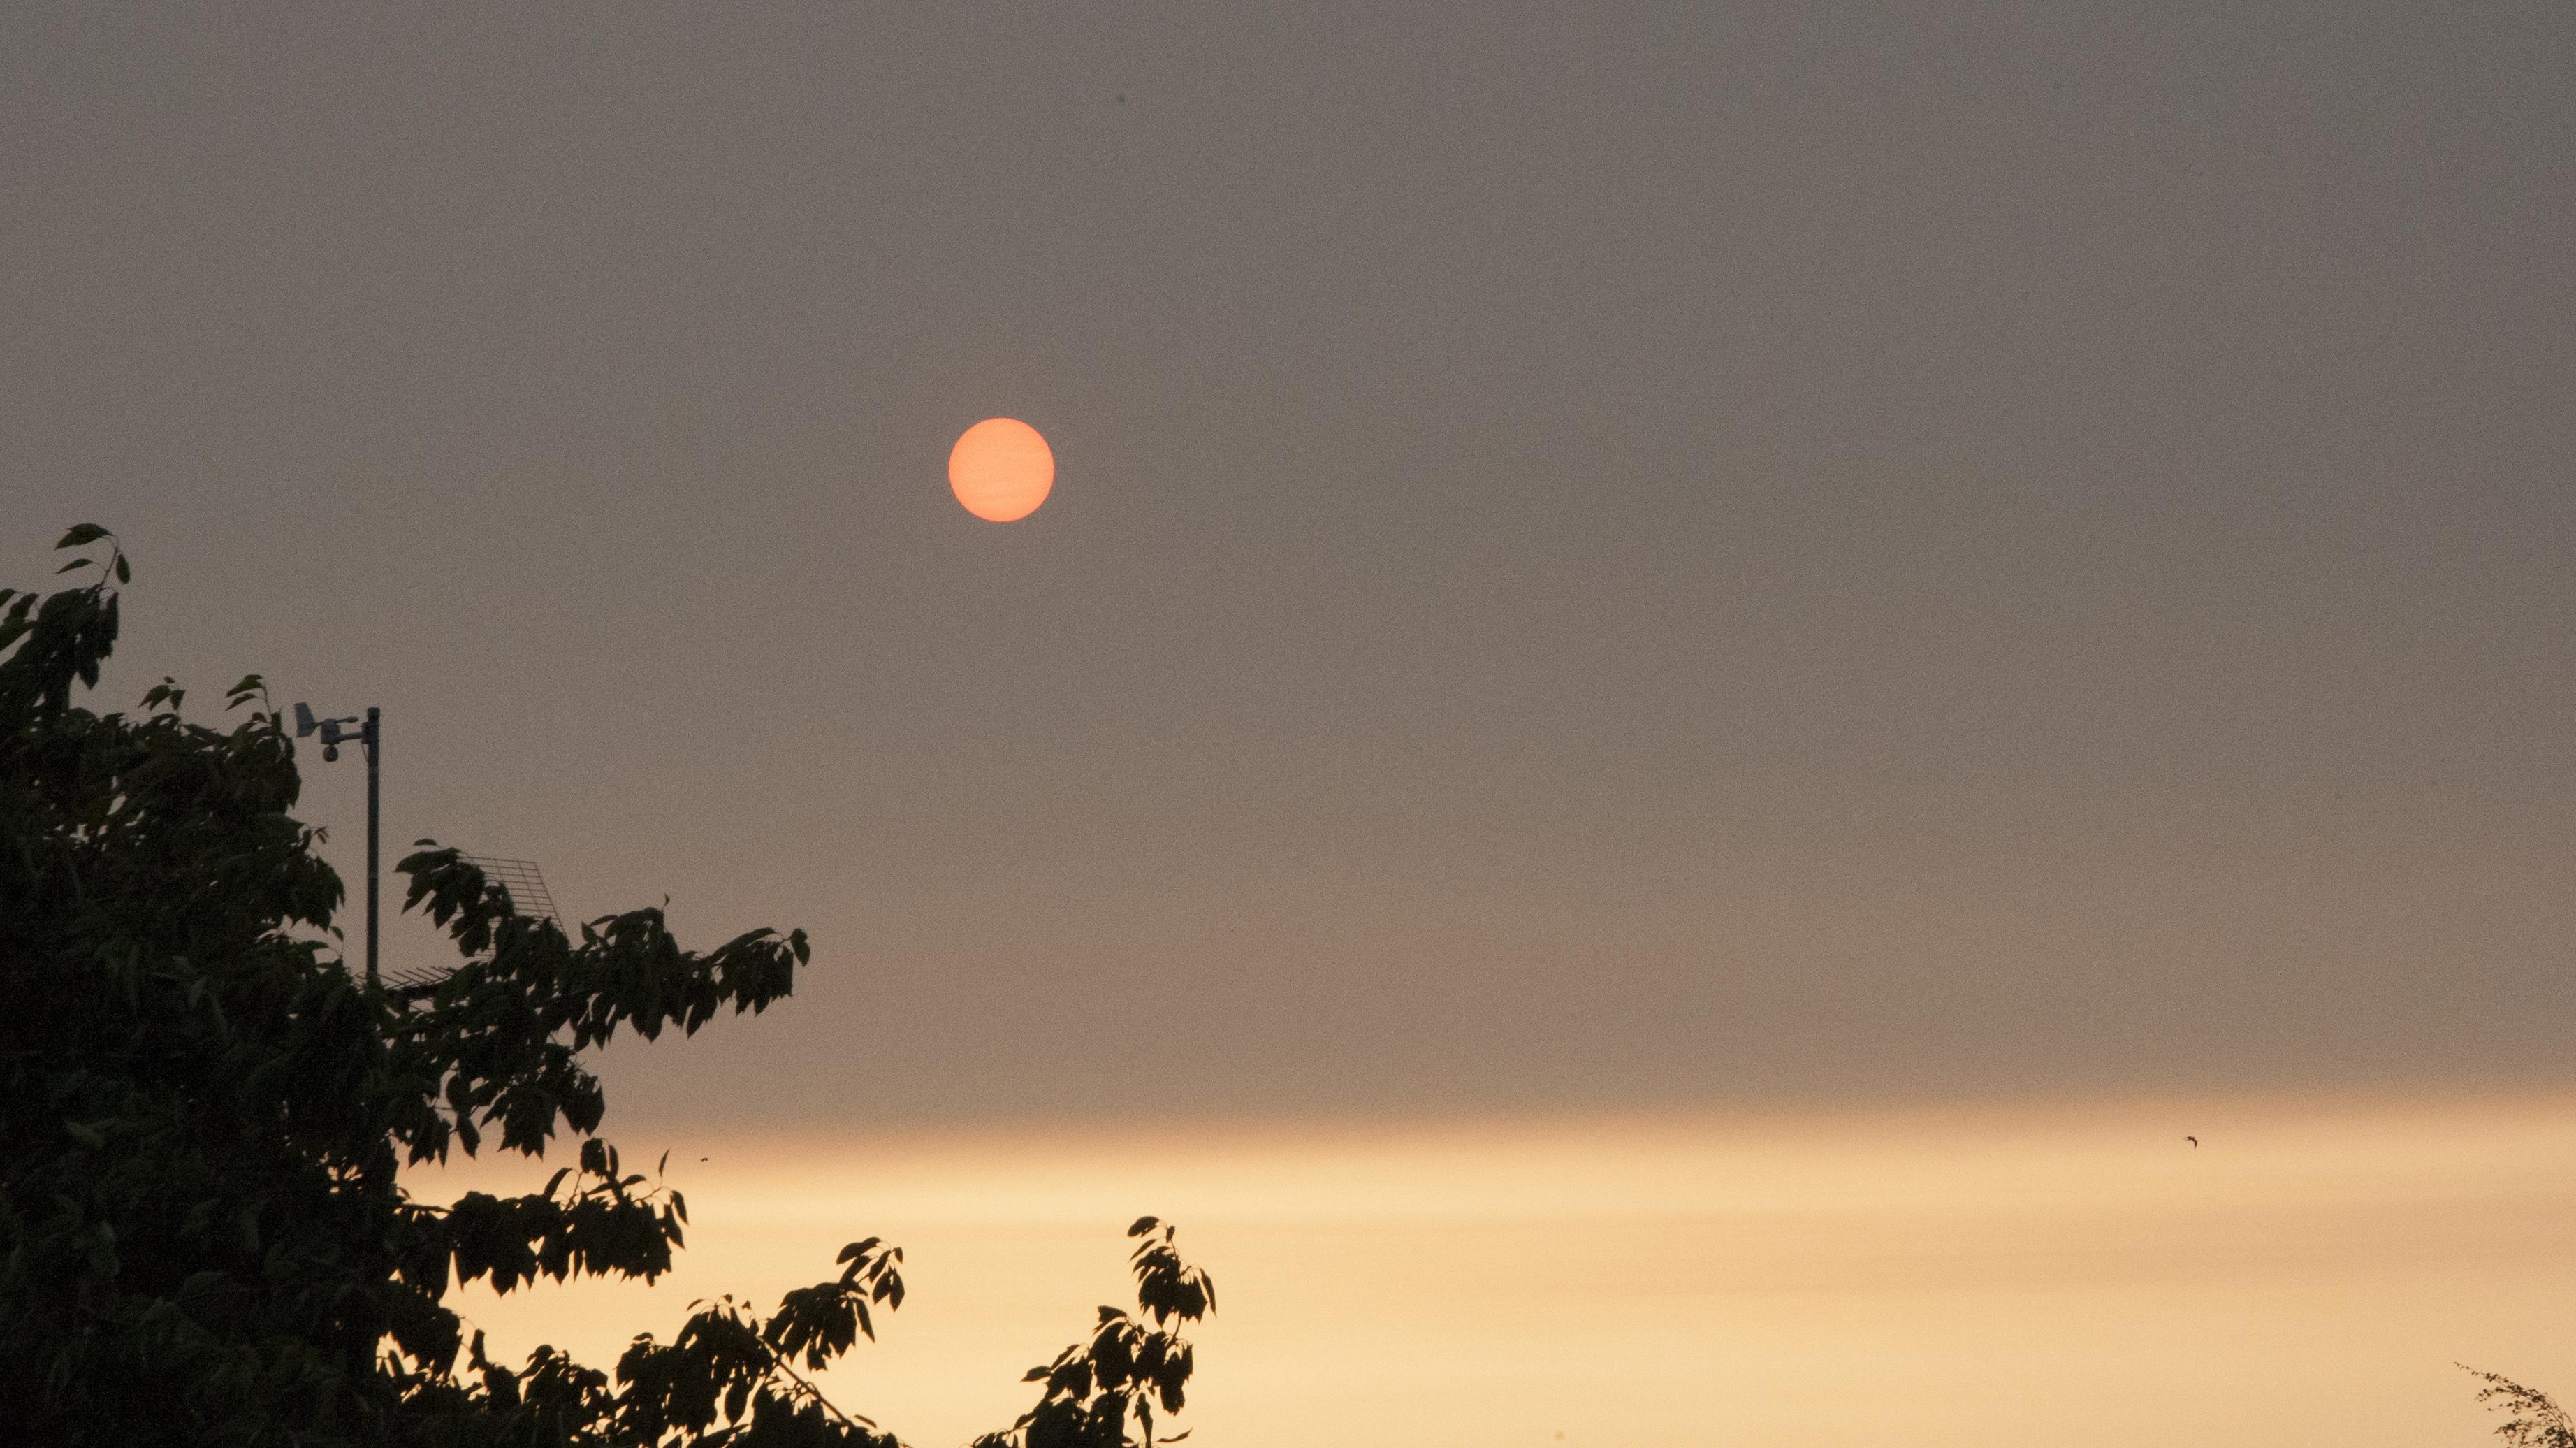 torben_boetius_koege_orange_sol.jpg